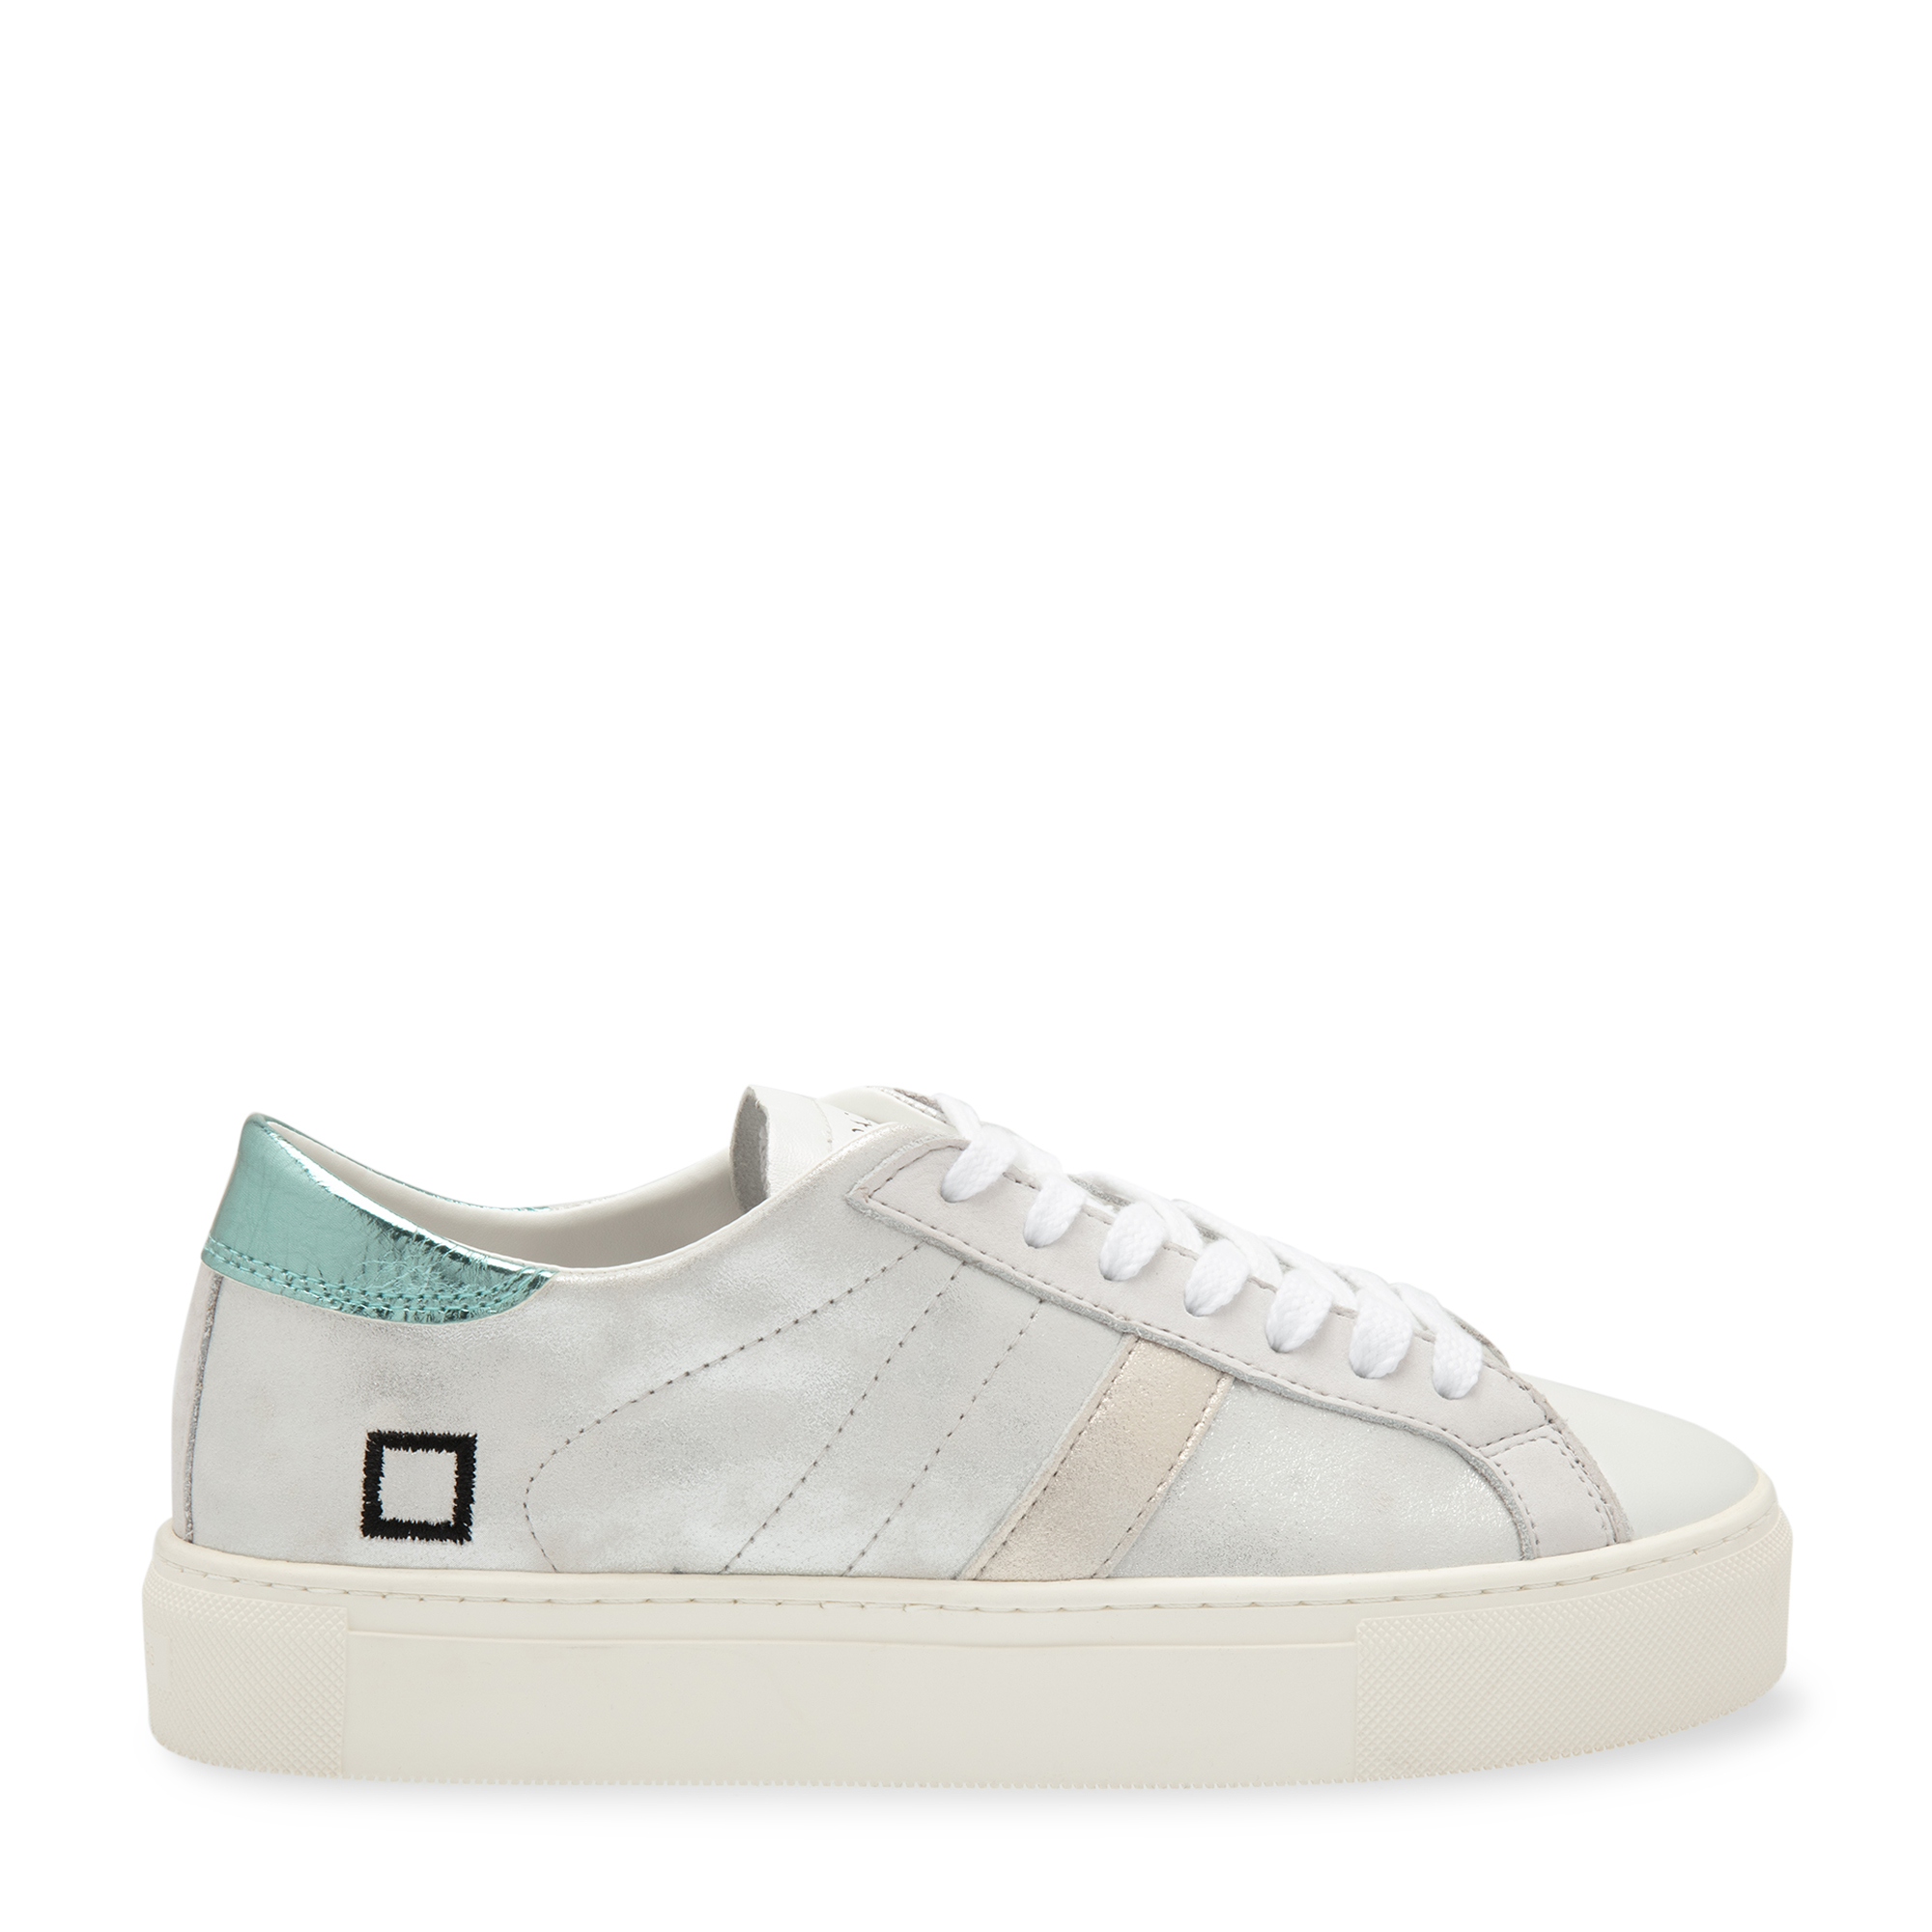 Vertigo sneakers